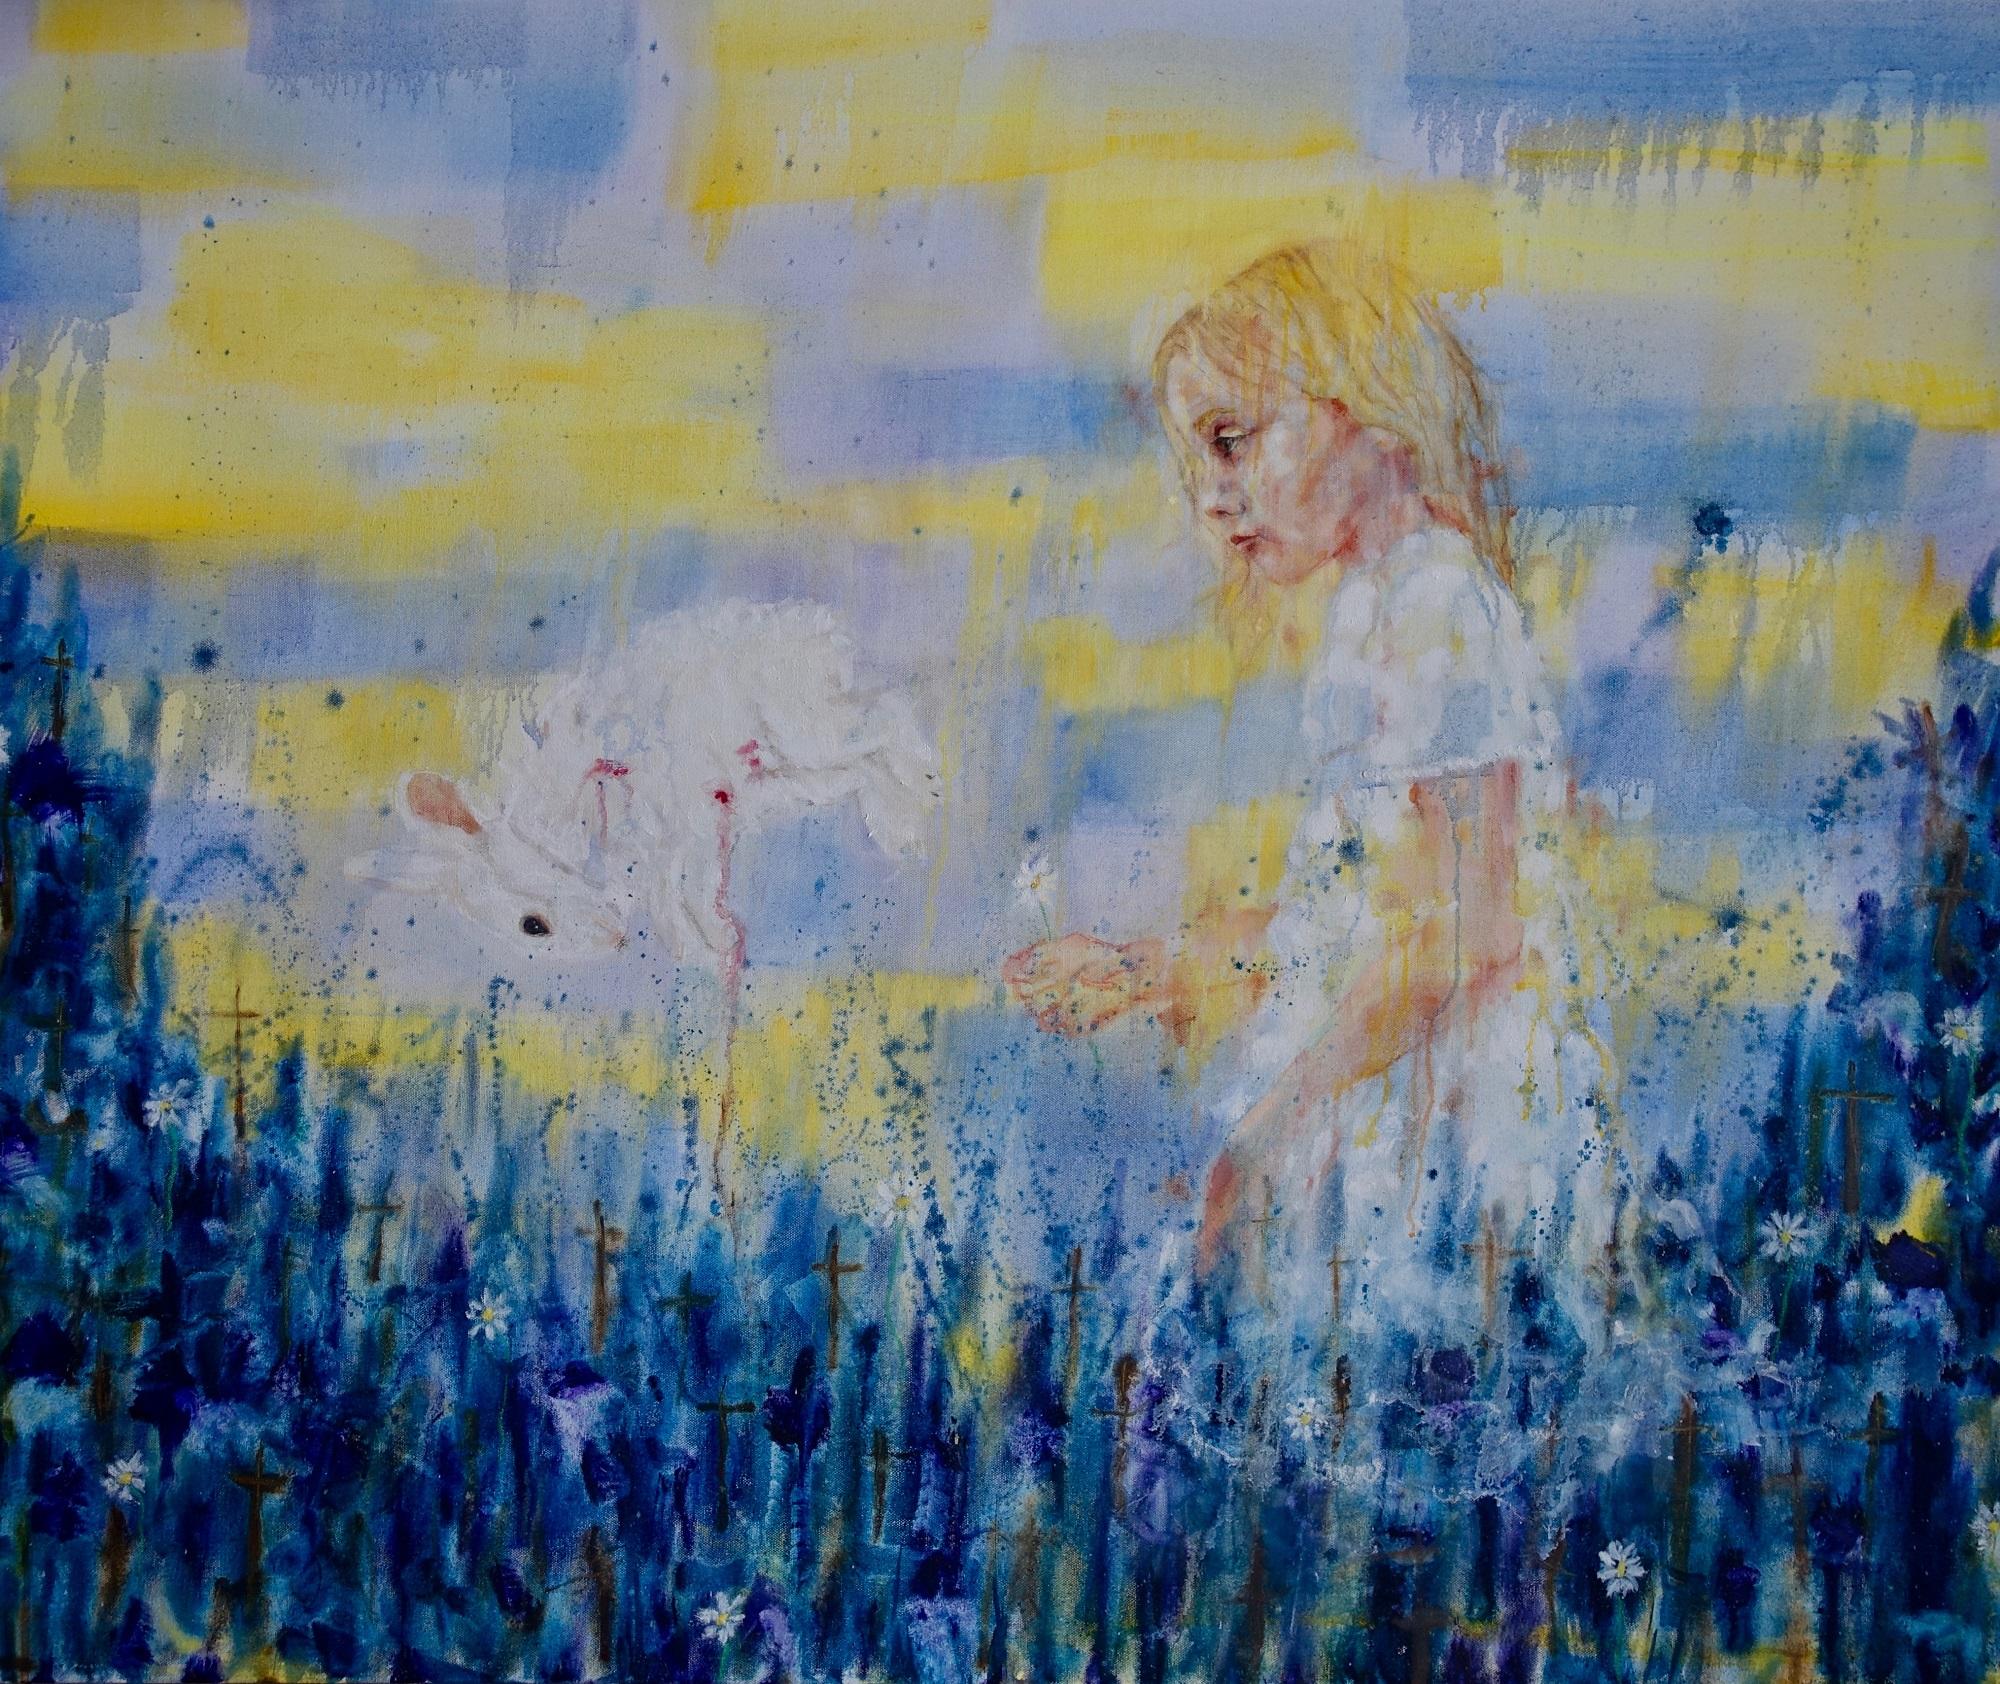 White rabbit, 2019 Jennifer Nieuwland Oil on canvas,100 x 120 cm